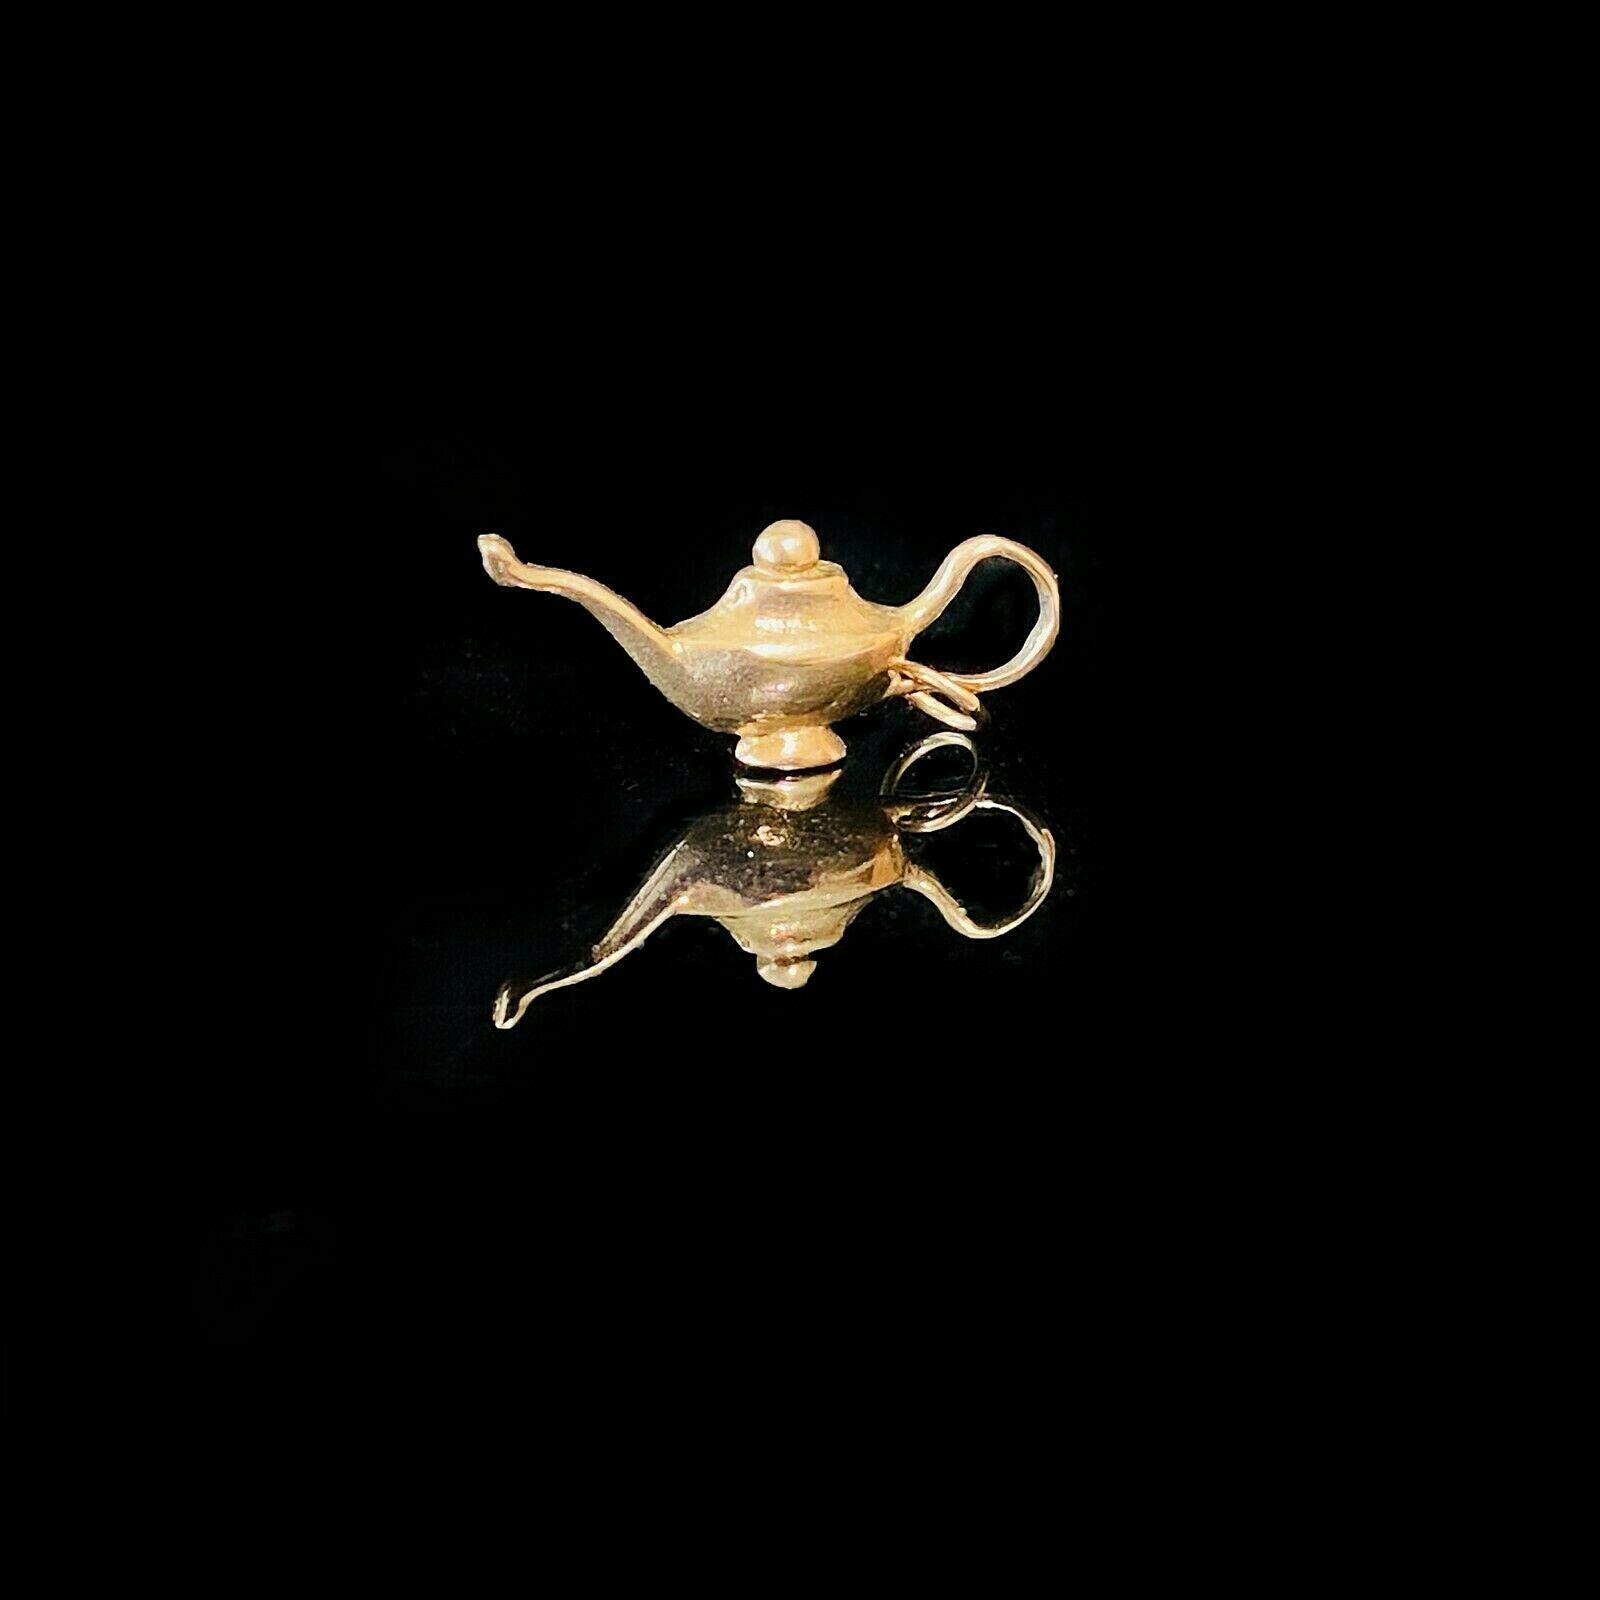 Antique 9ct, 9k, 375 rose gold, solid Genie lamp pendant, charm, 3.0grams